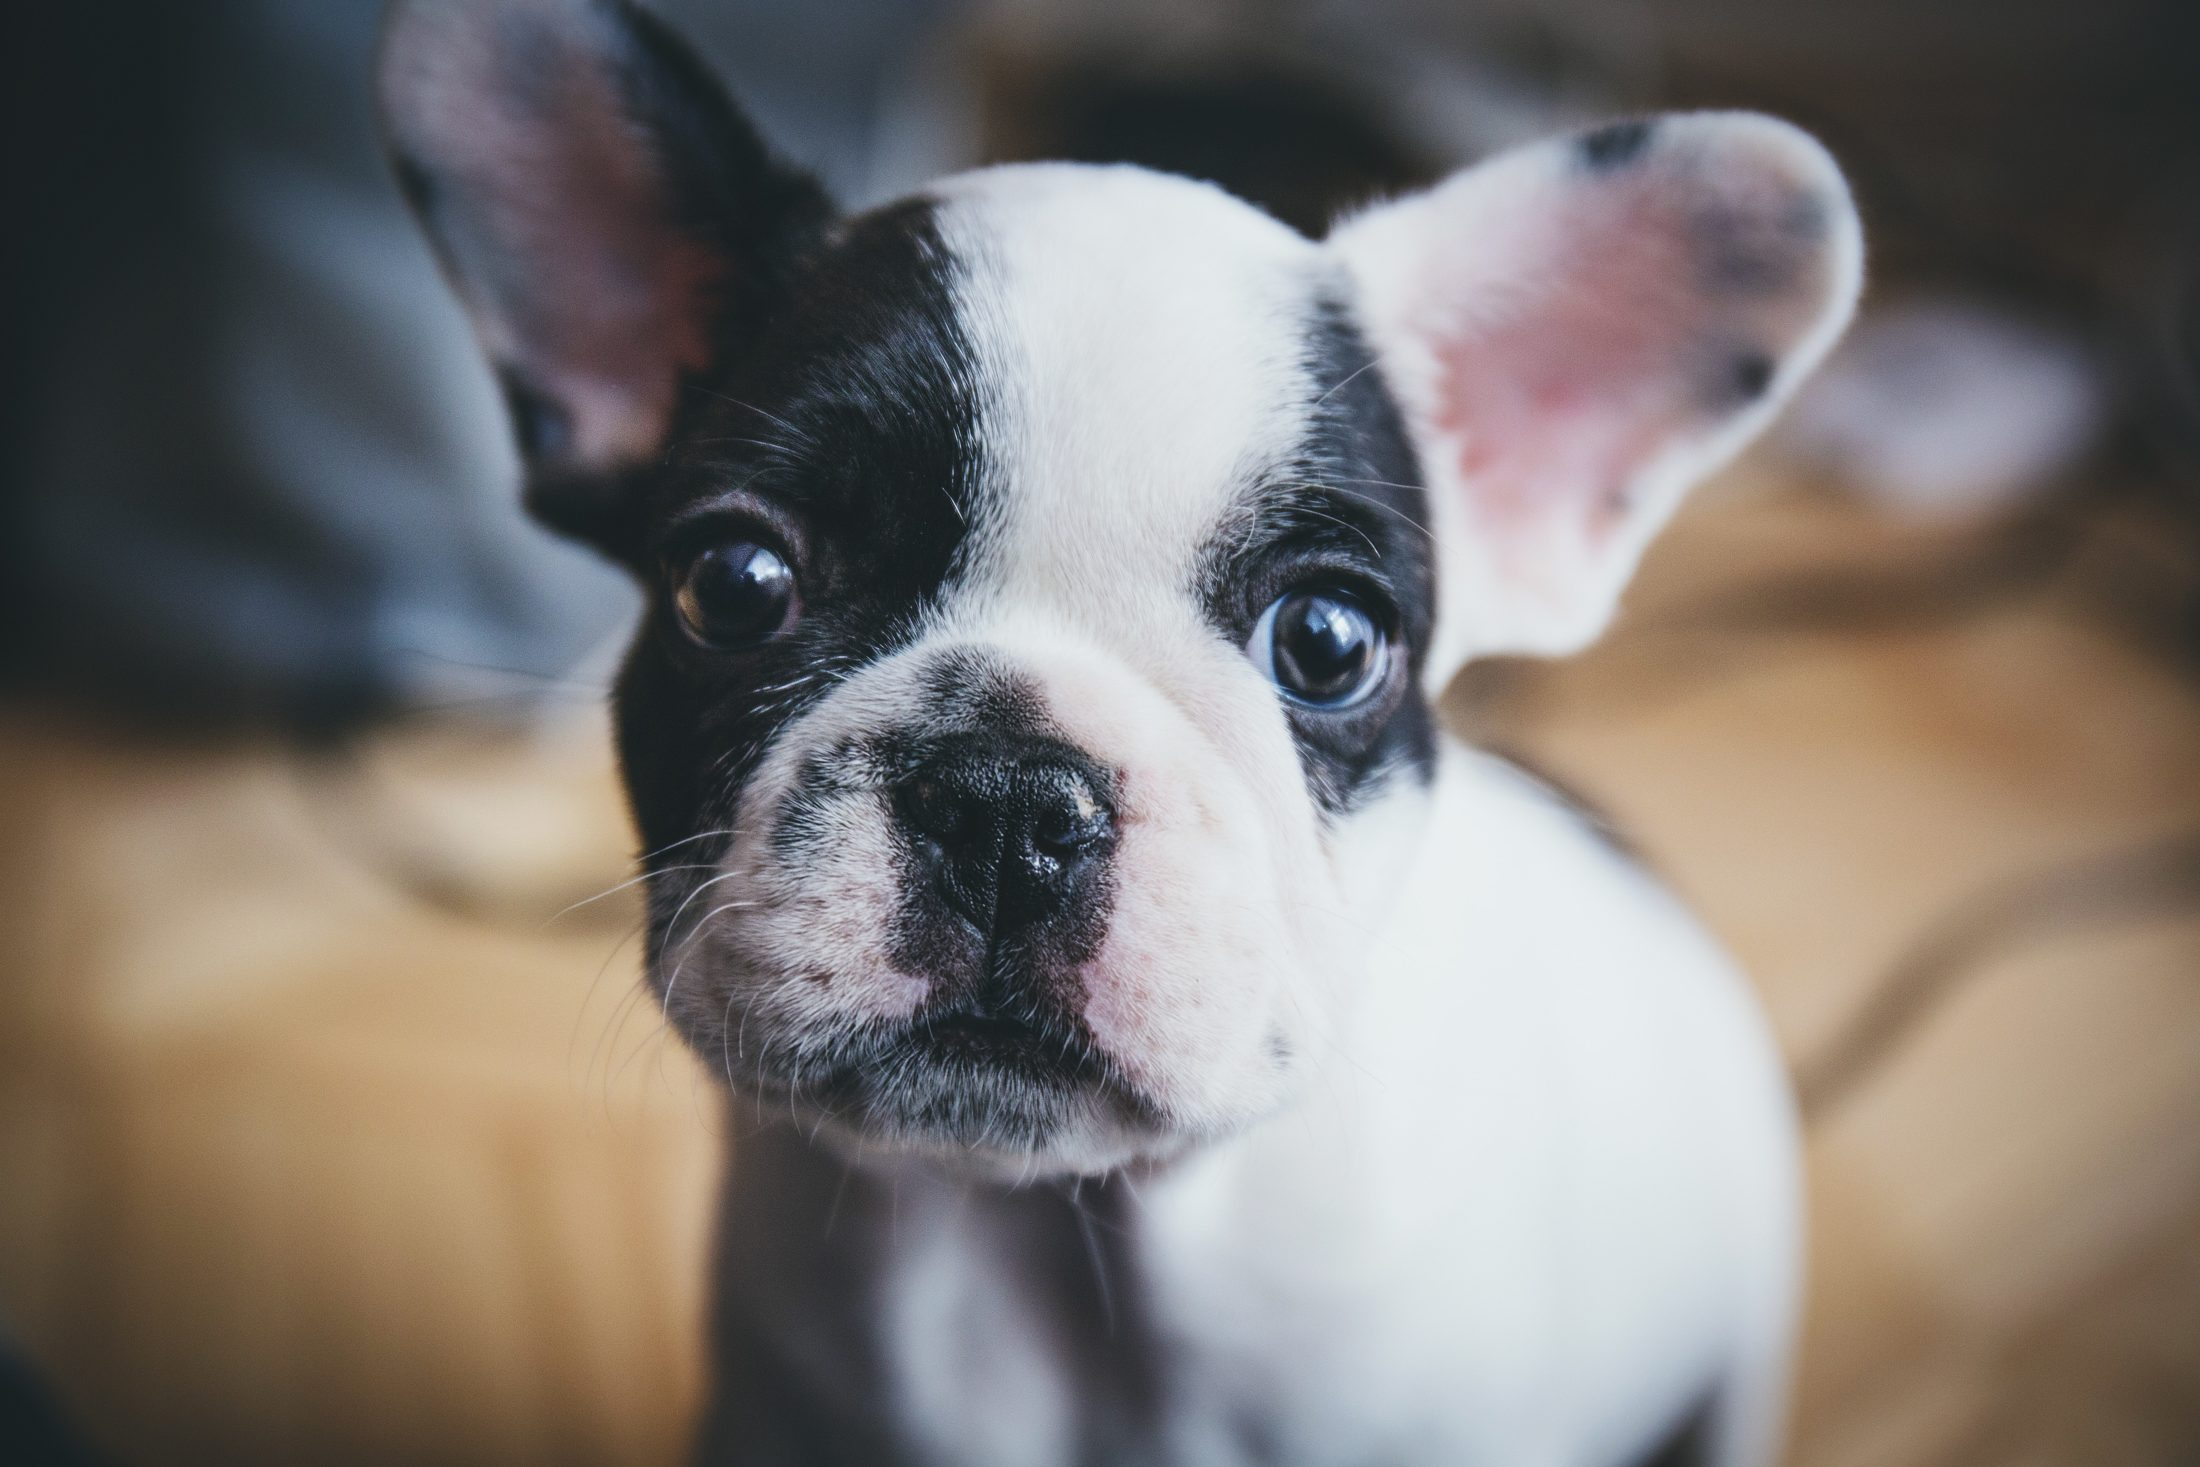 roubo de cachorro - buldogue frances